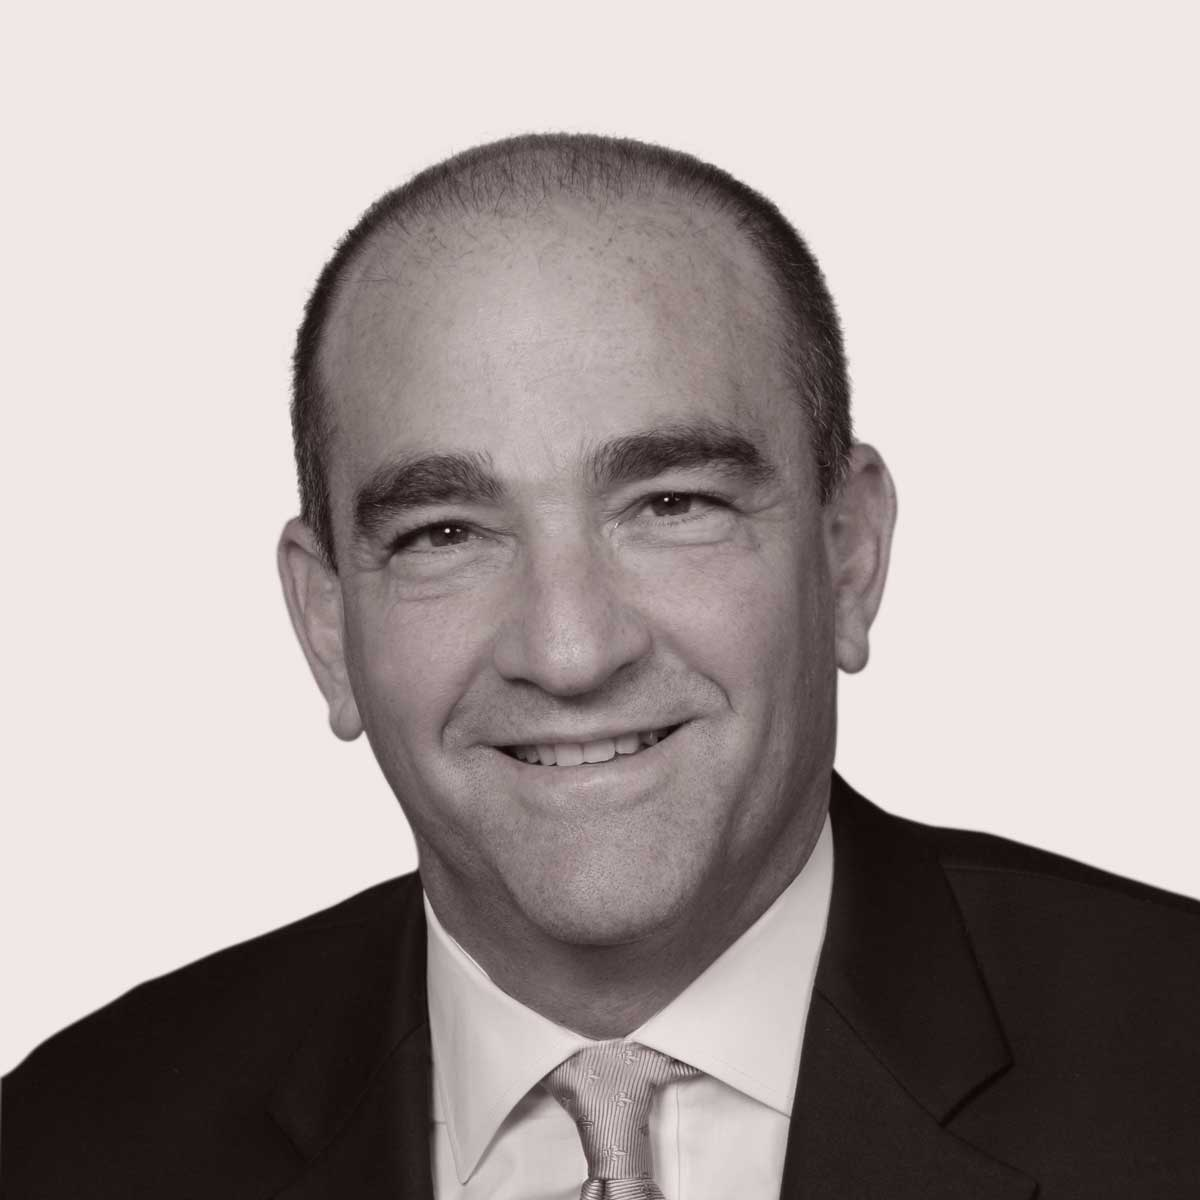 Dr. Ben Hoffman, MD, MPH